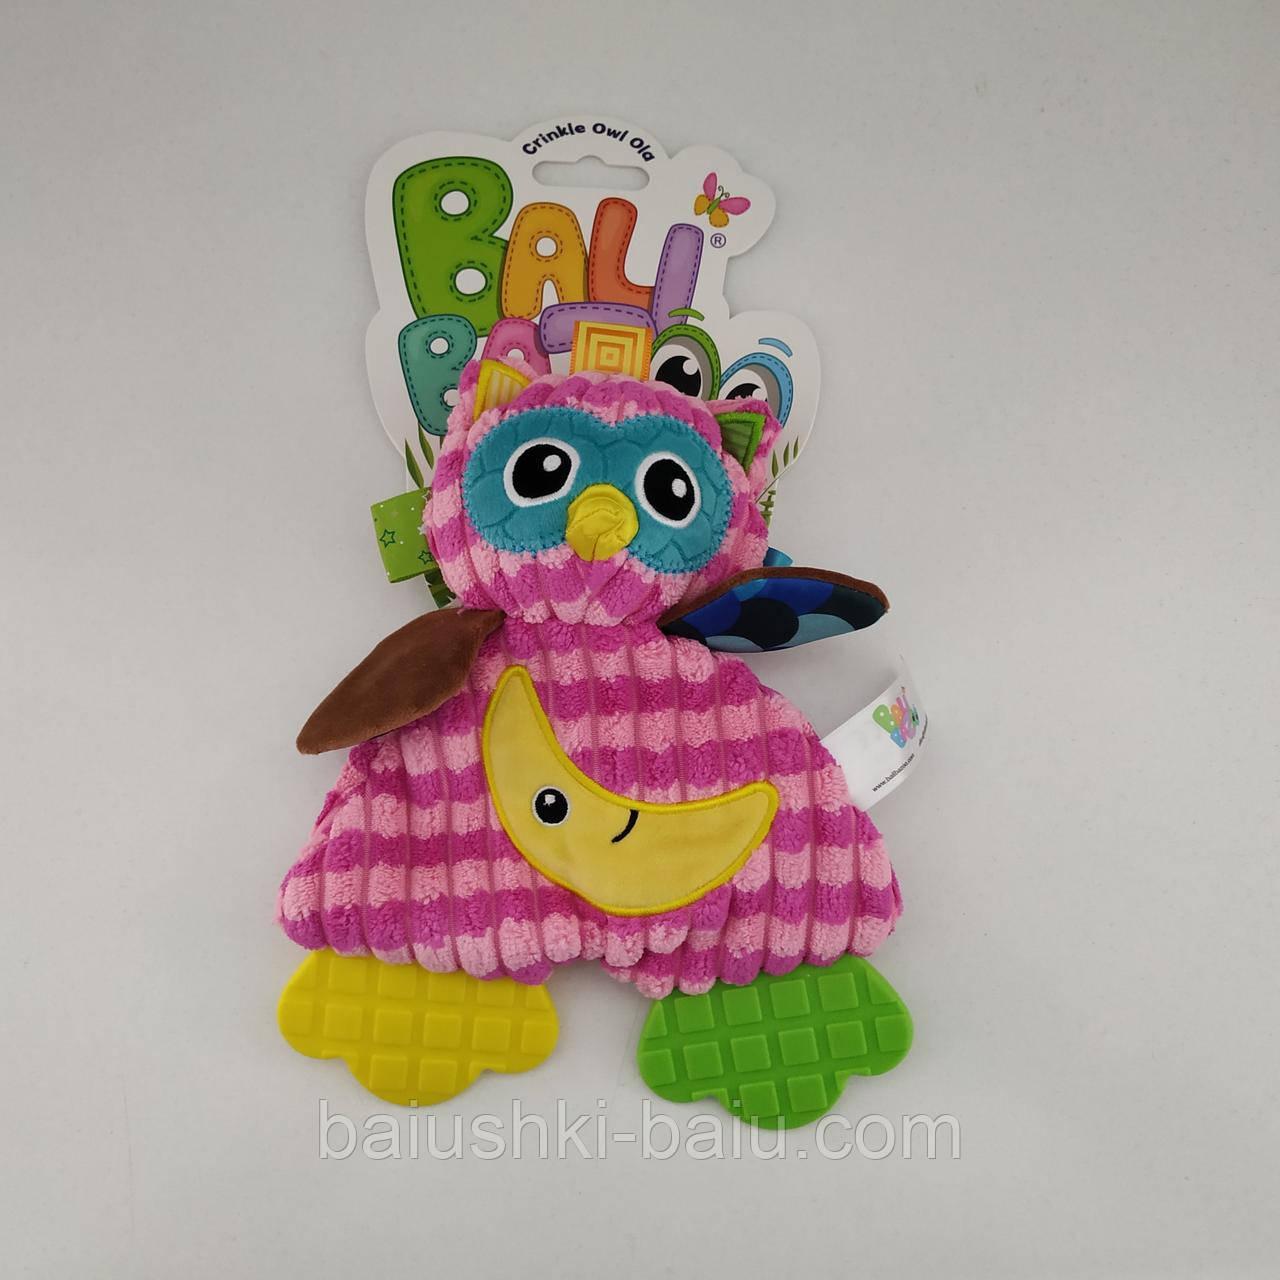 "Мягкая игрушка обнимашка с прорезывателем шуршалка ""Сова Габби"" (21 см) от ТМ Balibazoo."